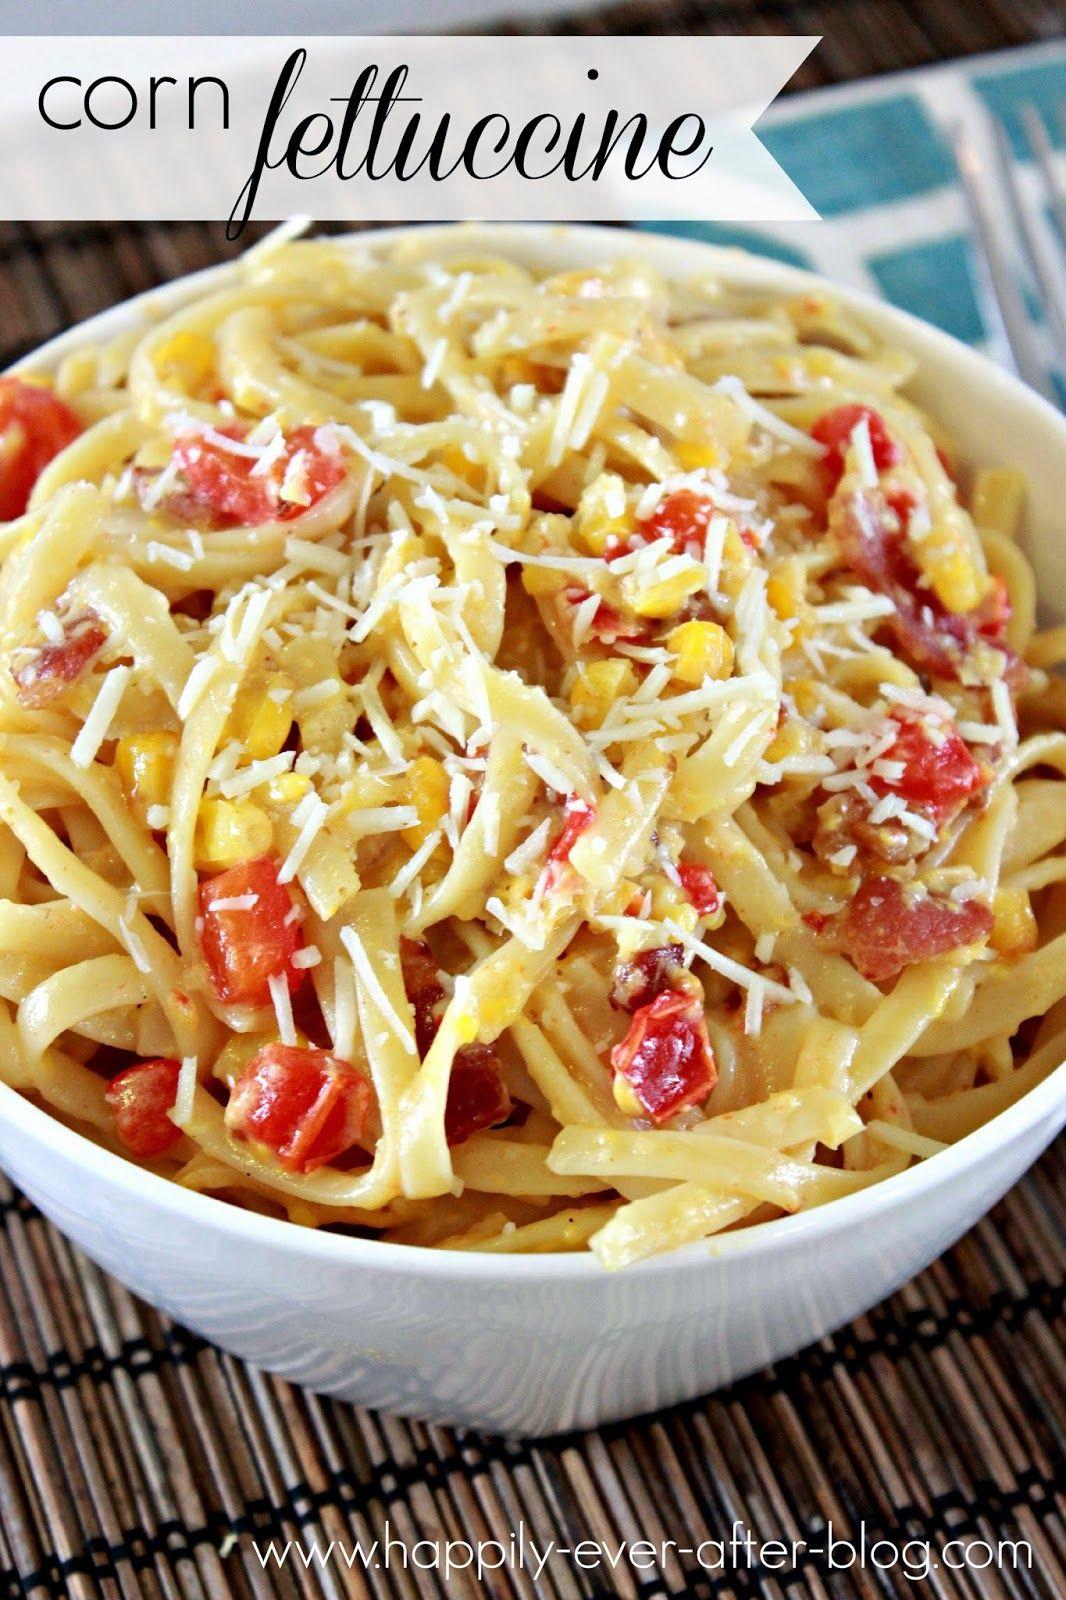 Corn fettuccine cooking recipes dinner fettuccine